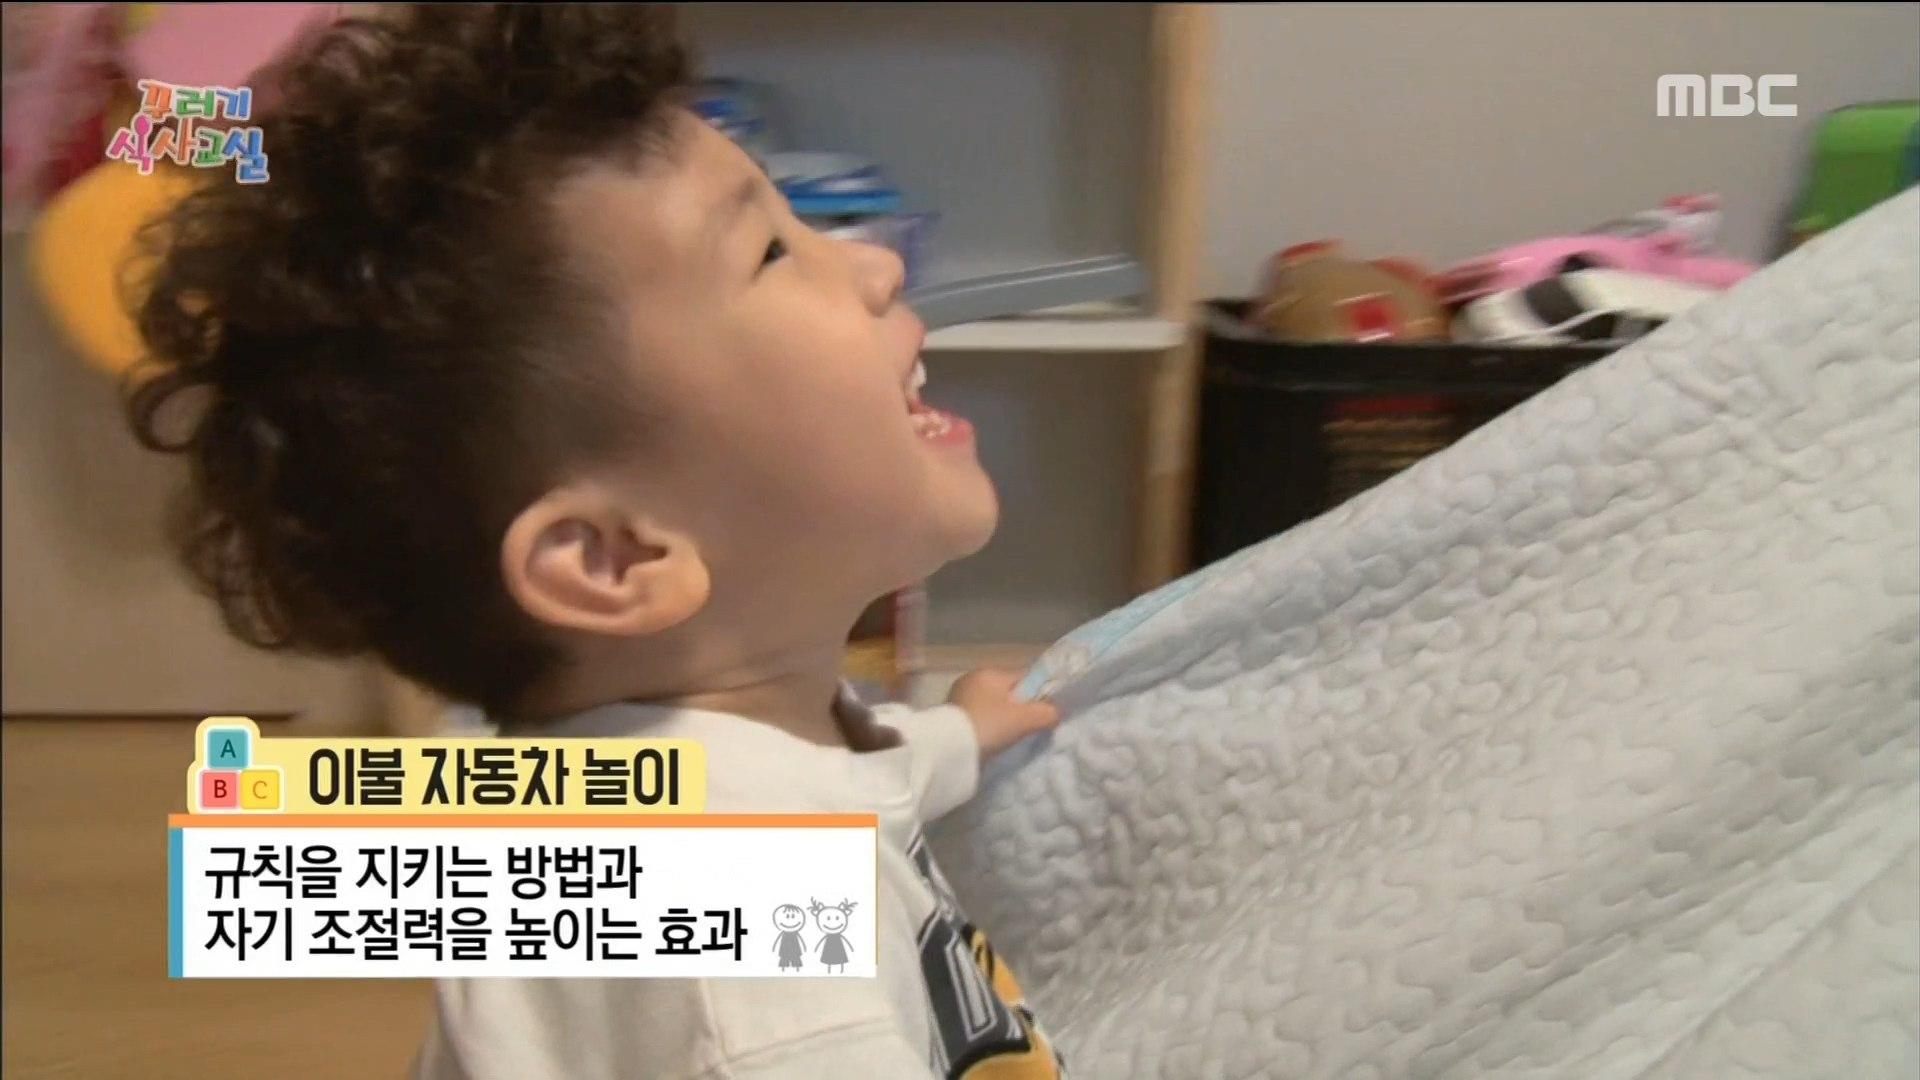 [KIDS]  Play a personal play, 꾸러기식사교실 20181026